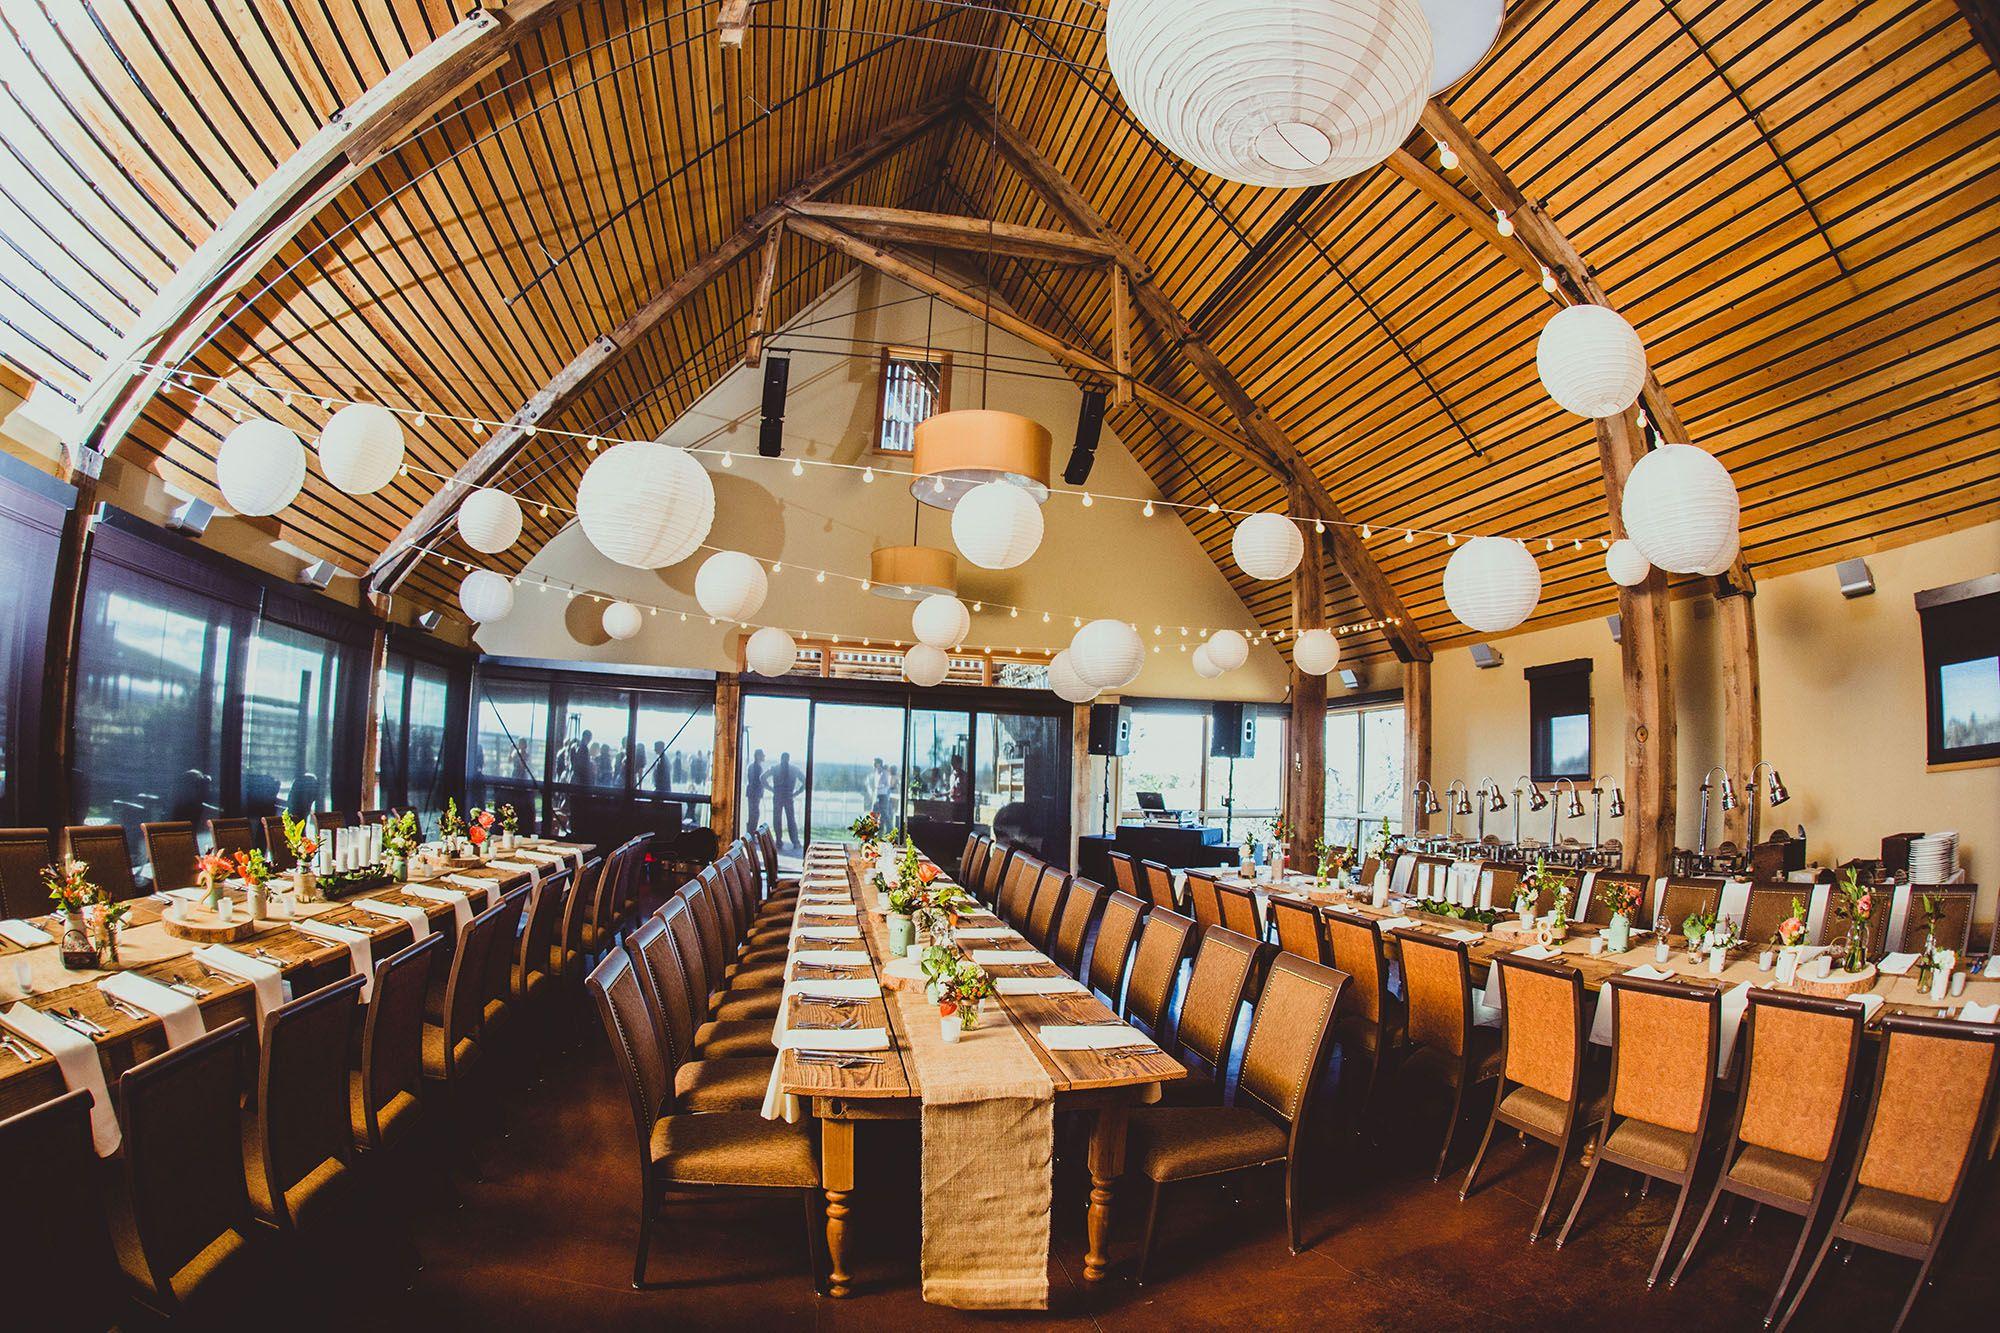 Jackie and Sarah The Barn Wedding Venue 2 | Wedding venues ...